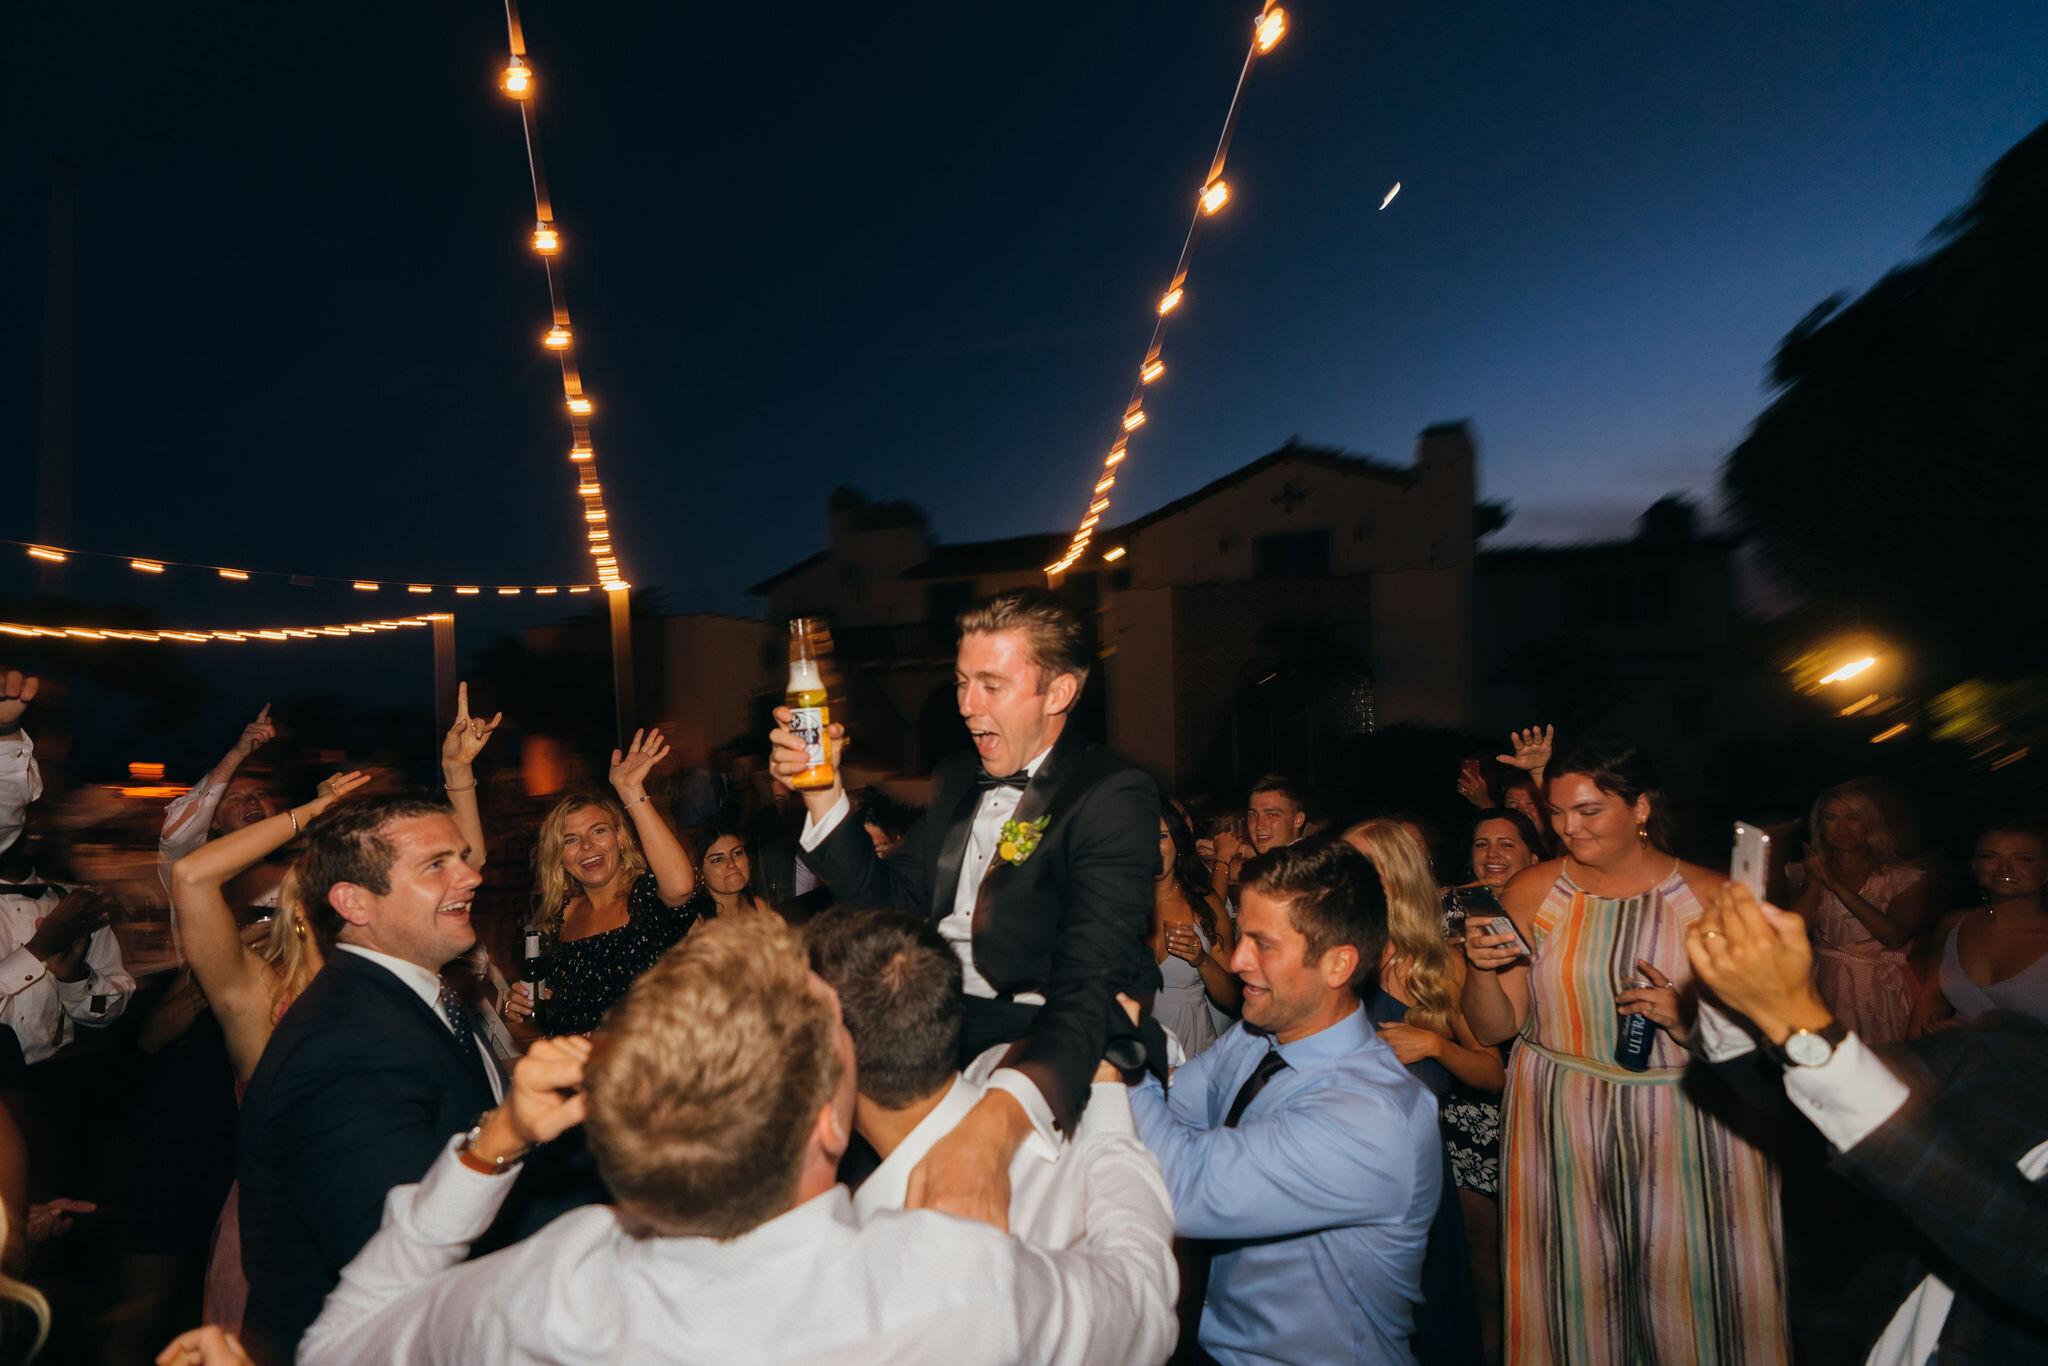 adamson-house-wedding-photography-182.jpg